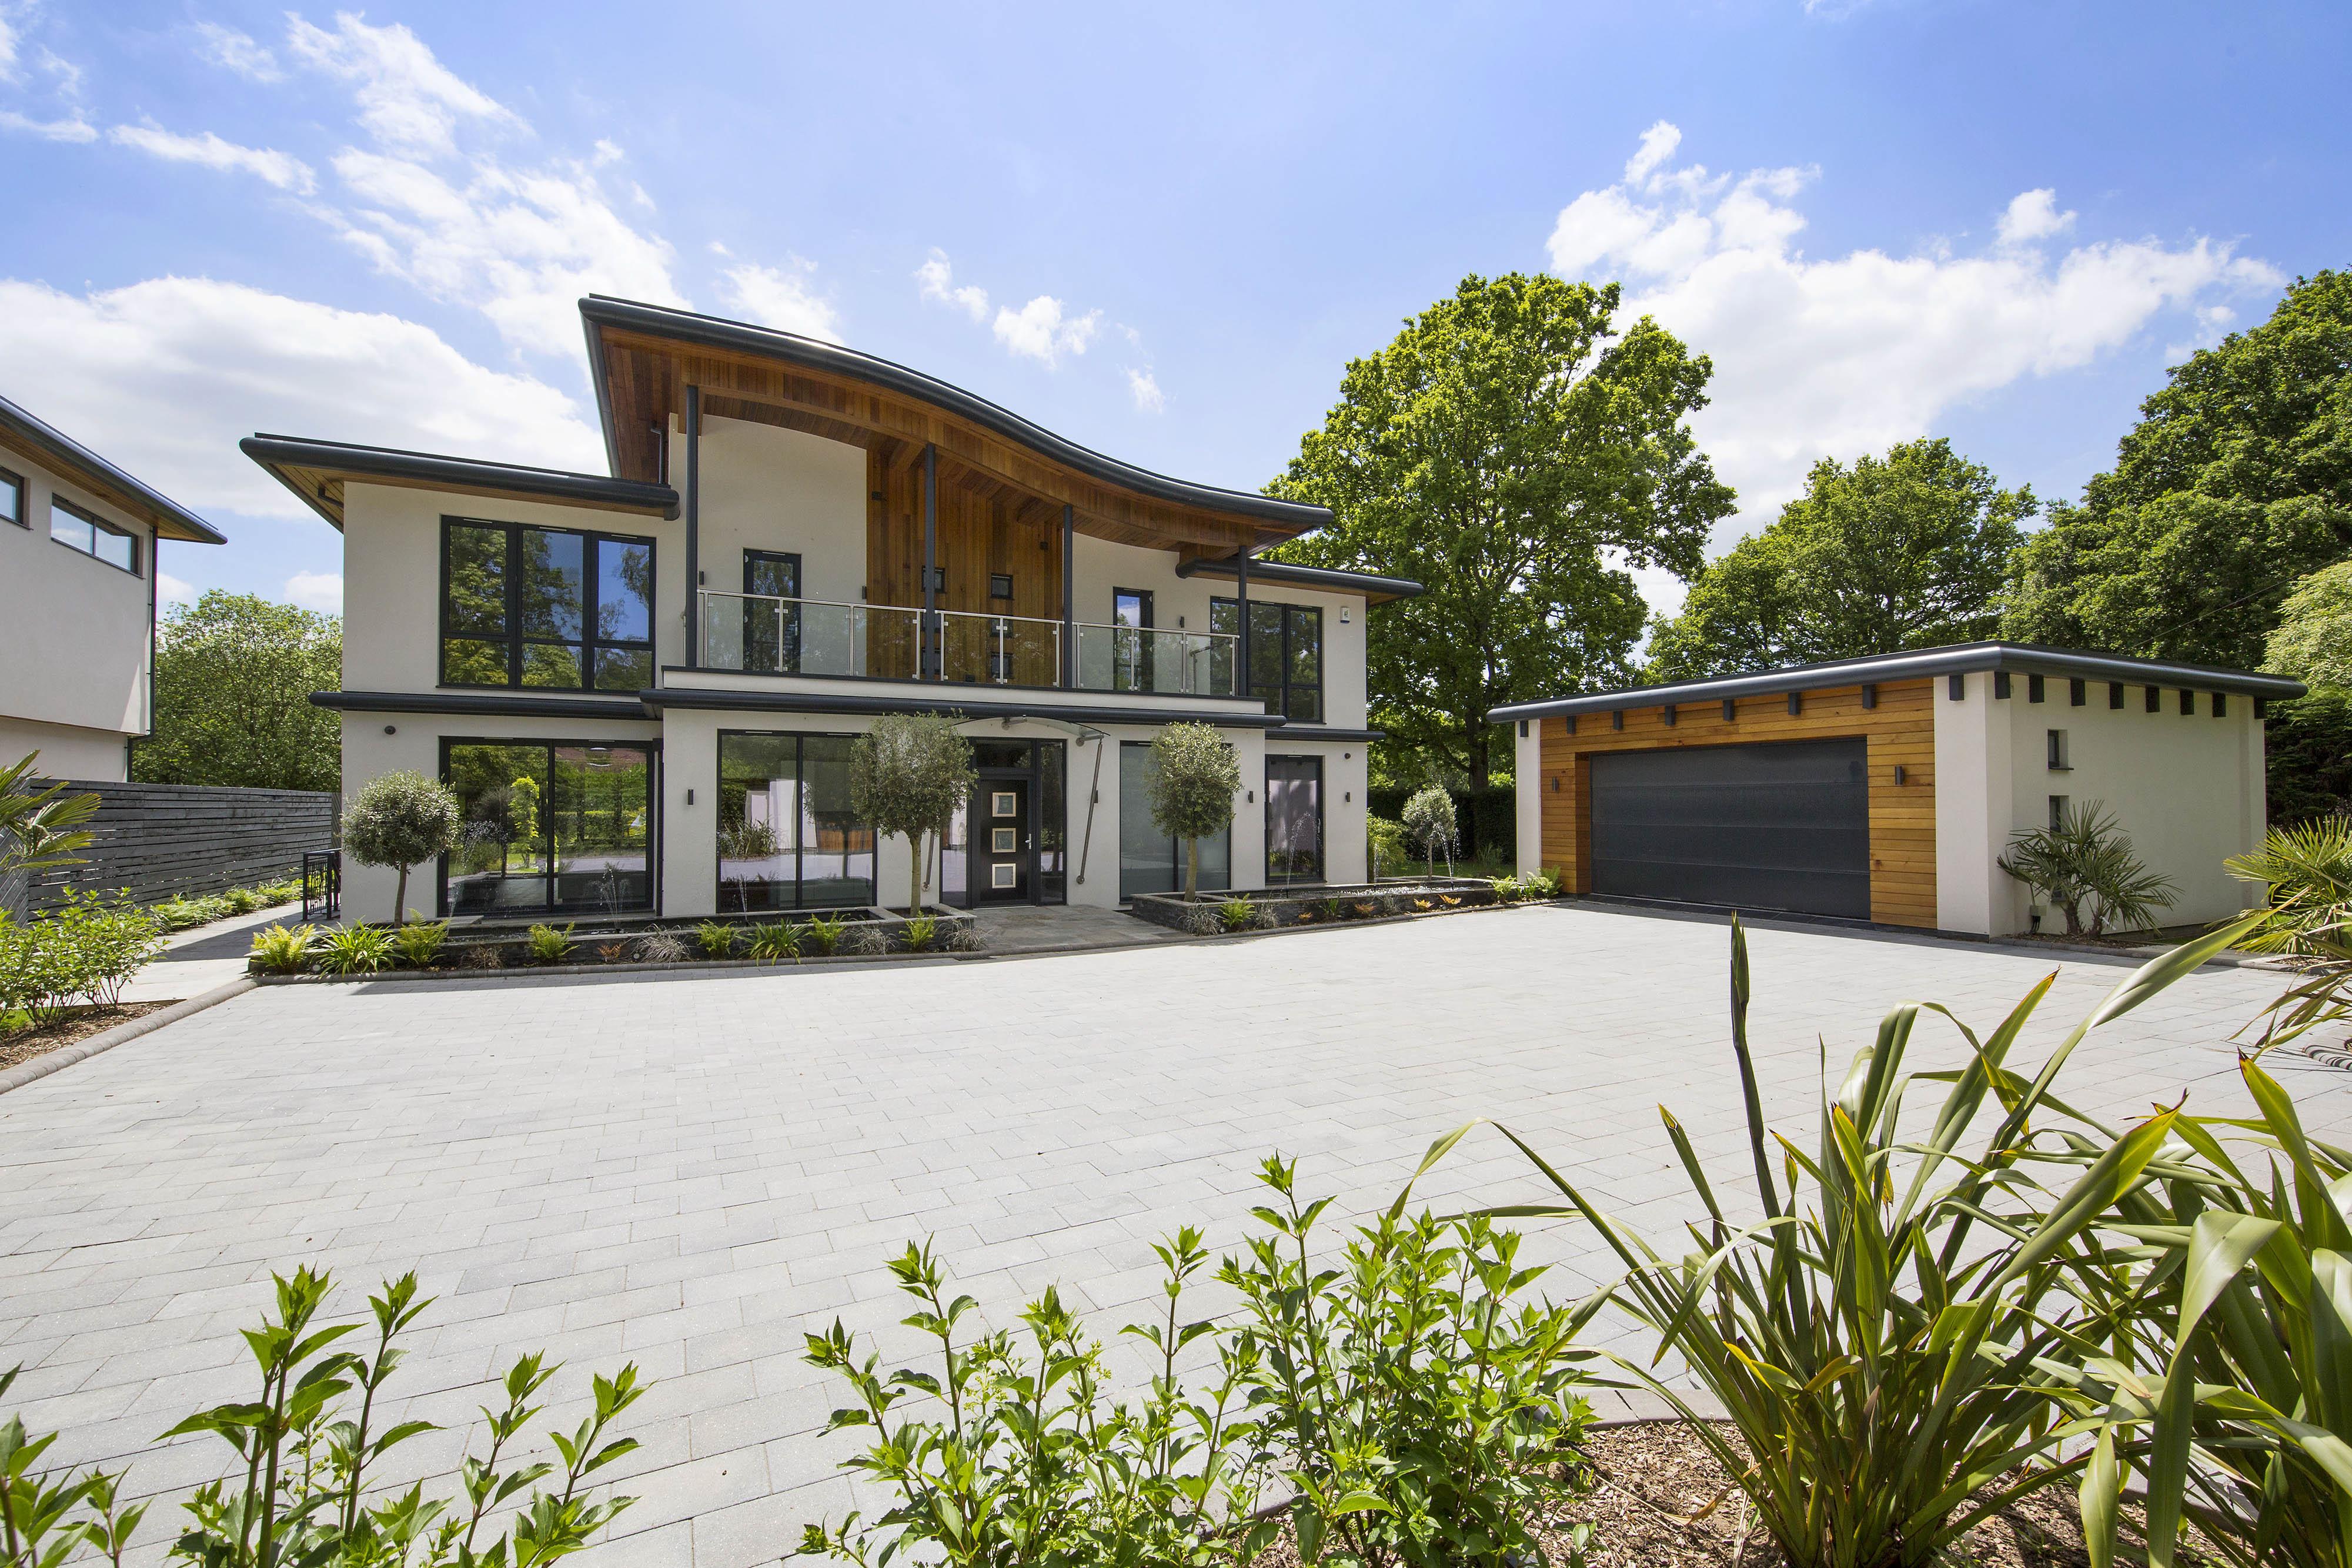 Single Family Home for Sale at Kingswood Sandy Lane Other England, England KT206NE United Kingdom